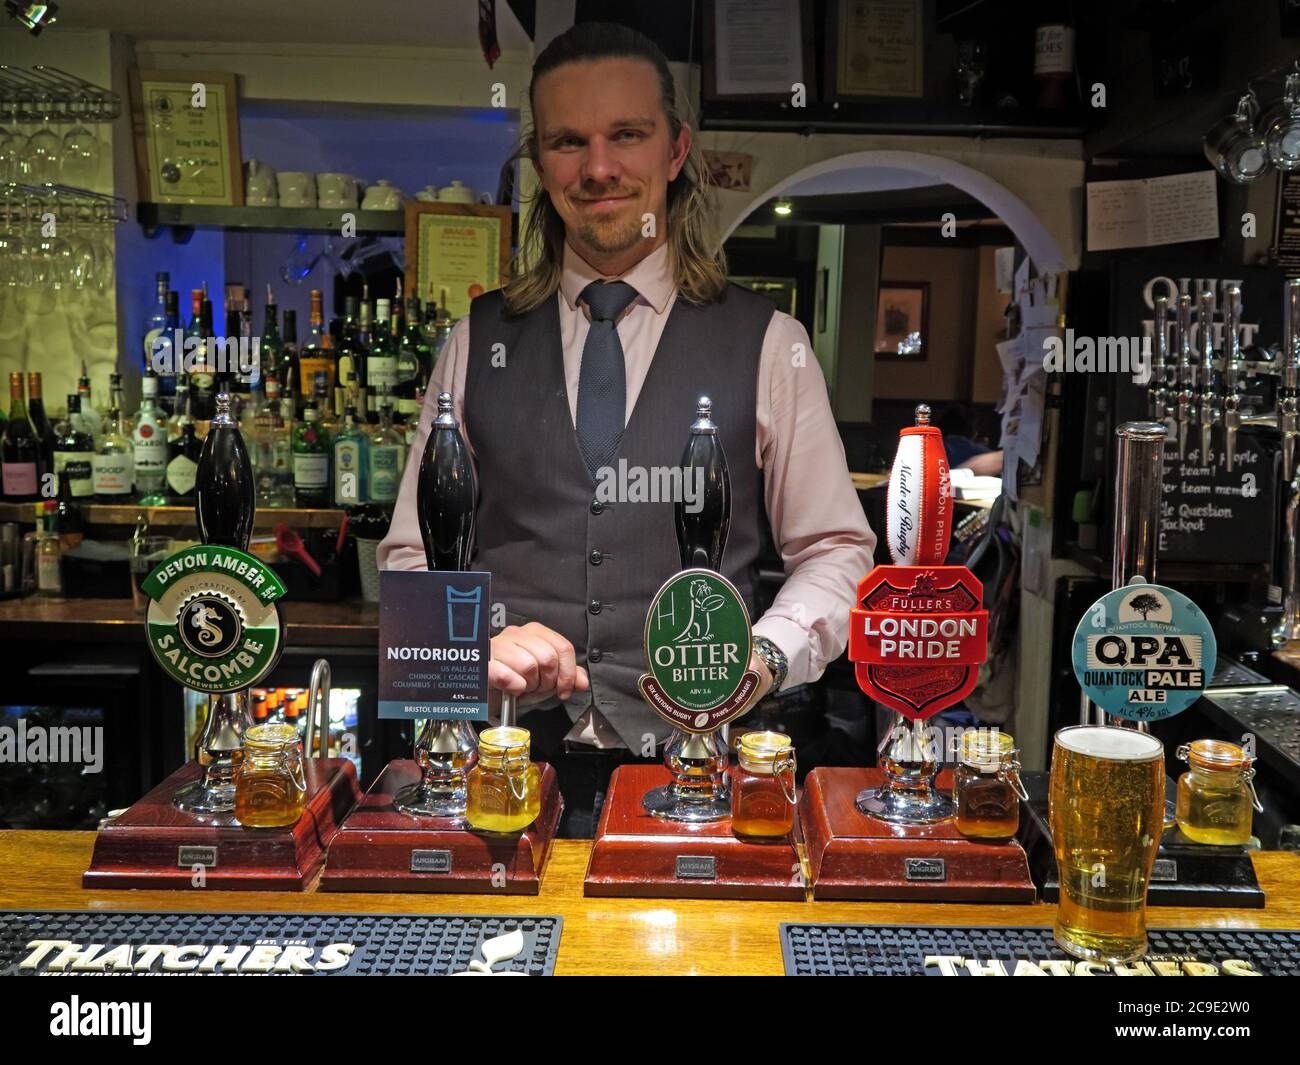 Dieses Stockfoto: Barman, Ring of Bells Pub, 16-17 St James St, Taunton, South West England, Großbritannien, TA1 1JS - 2C9E2W